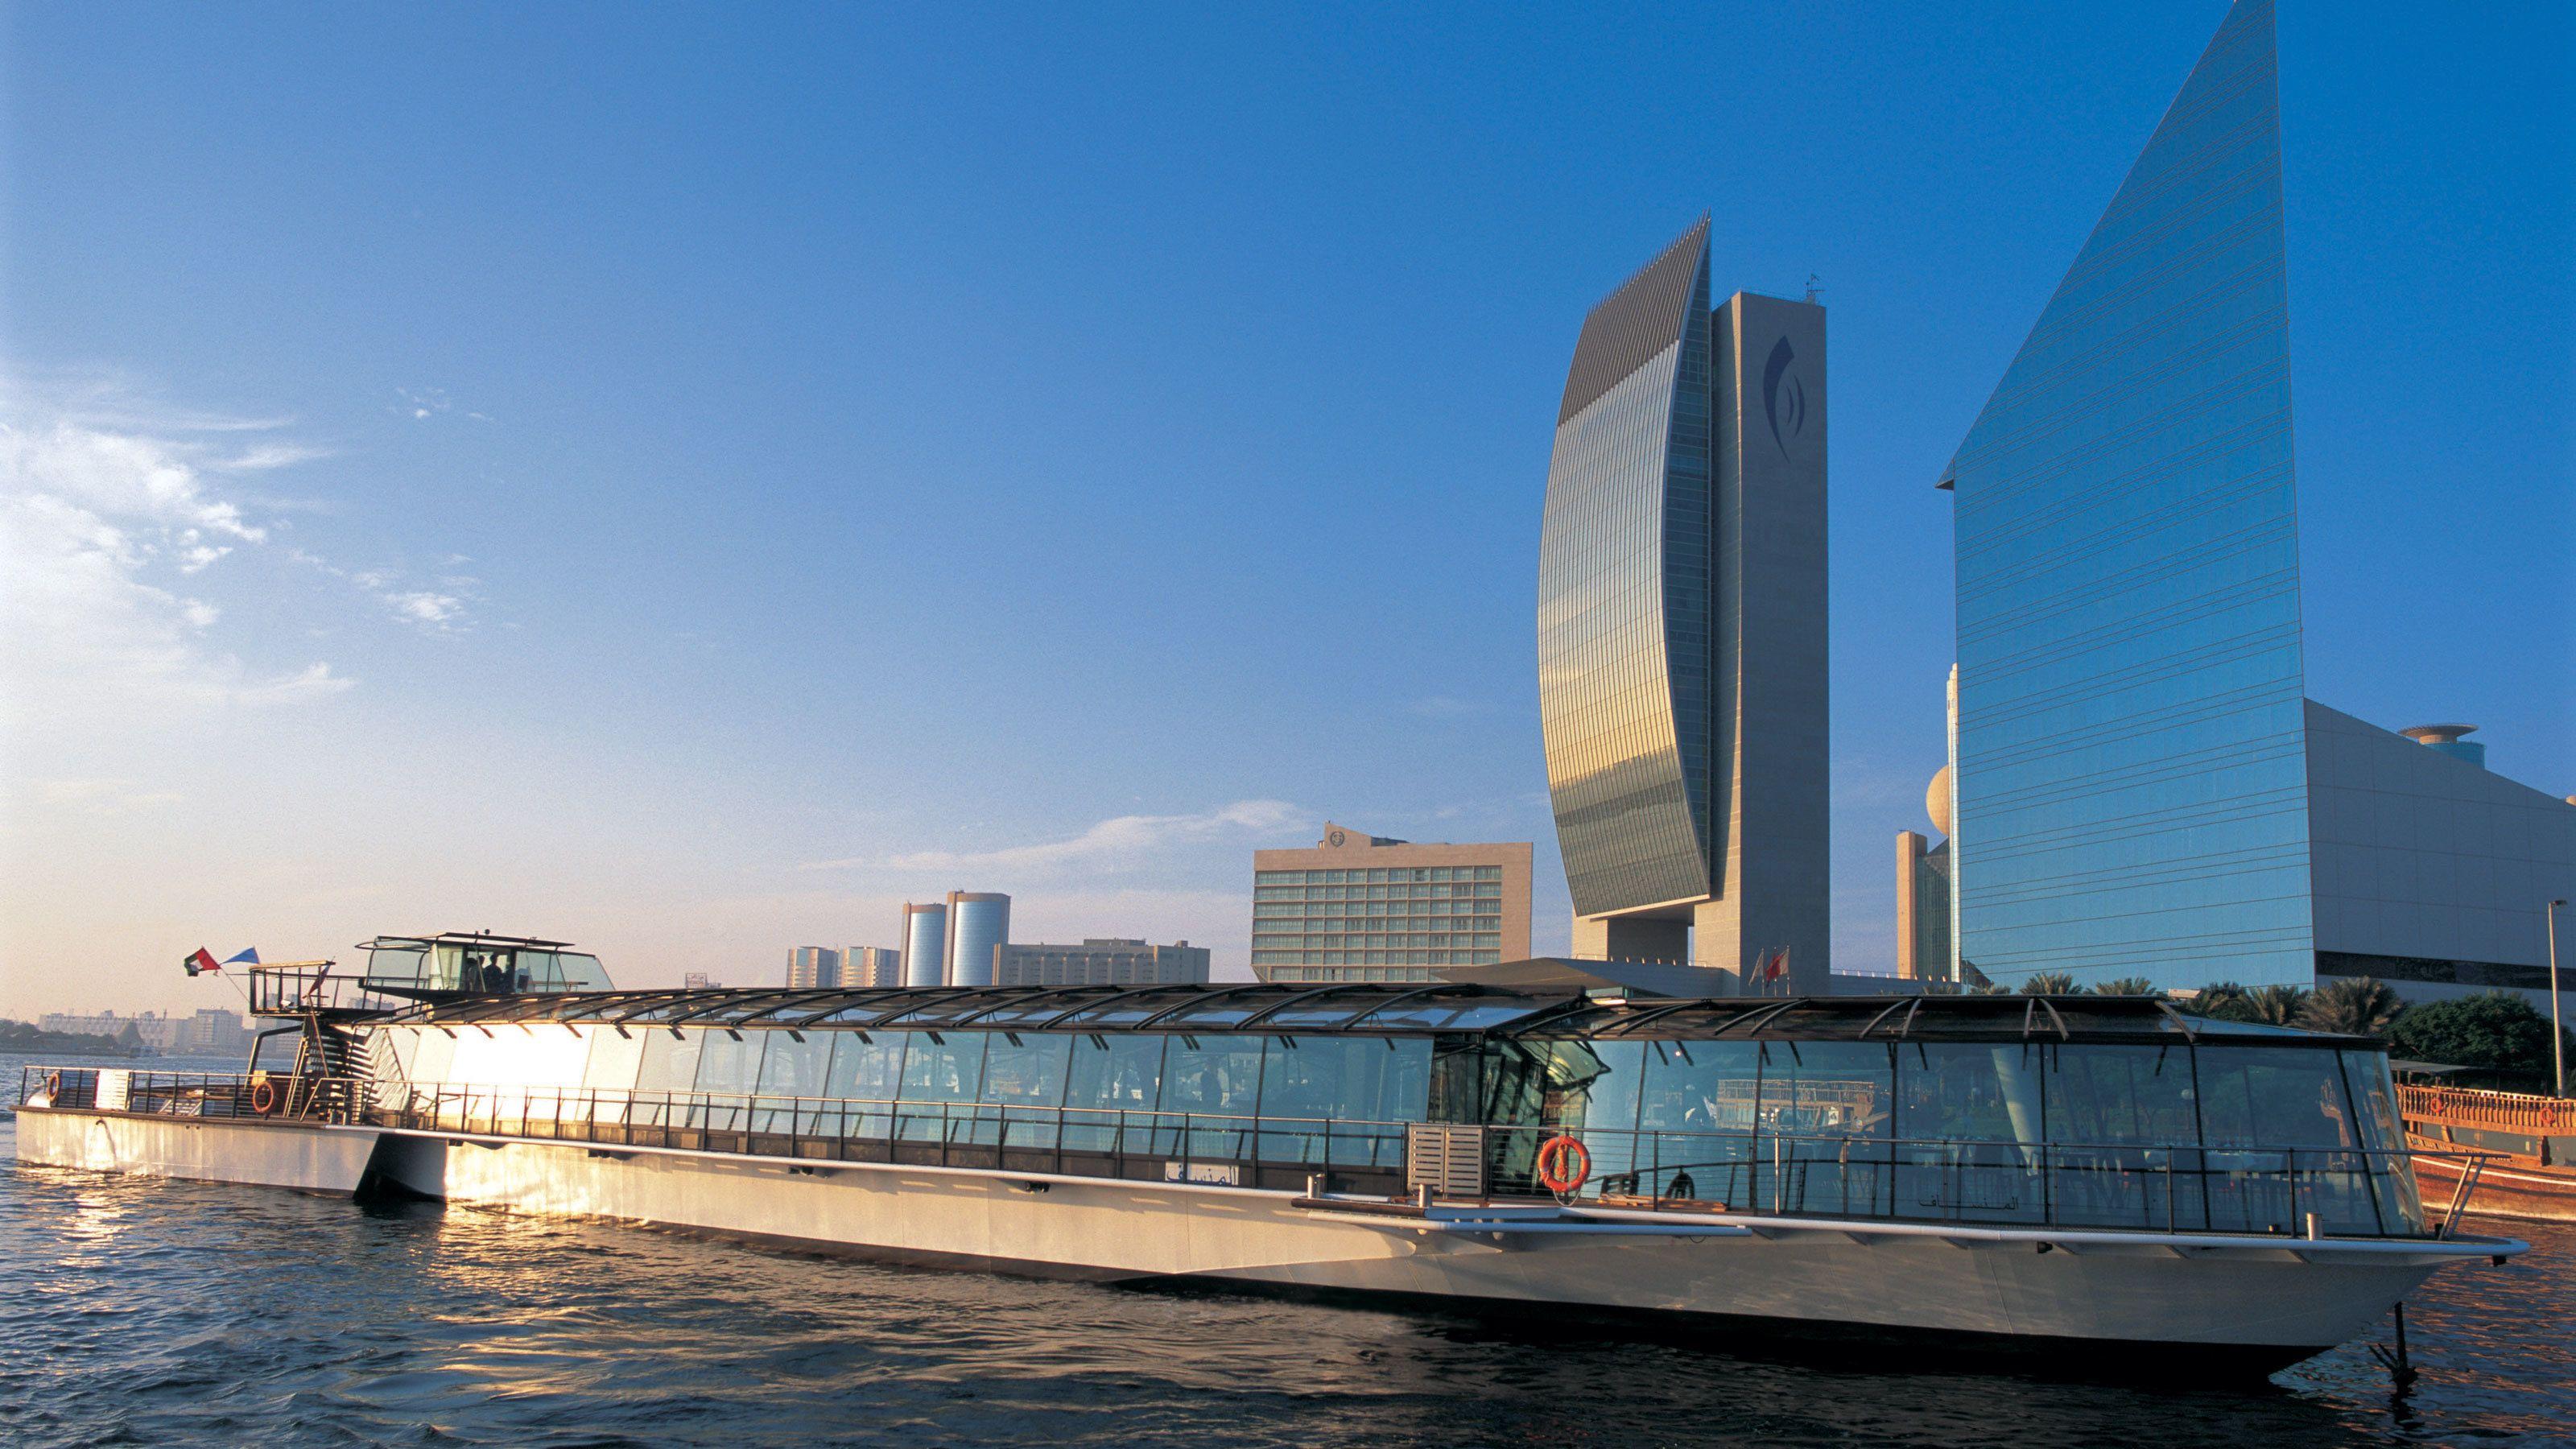 tour boat with glass windows in Dubai harbor